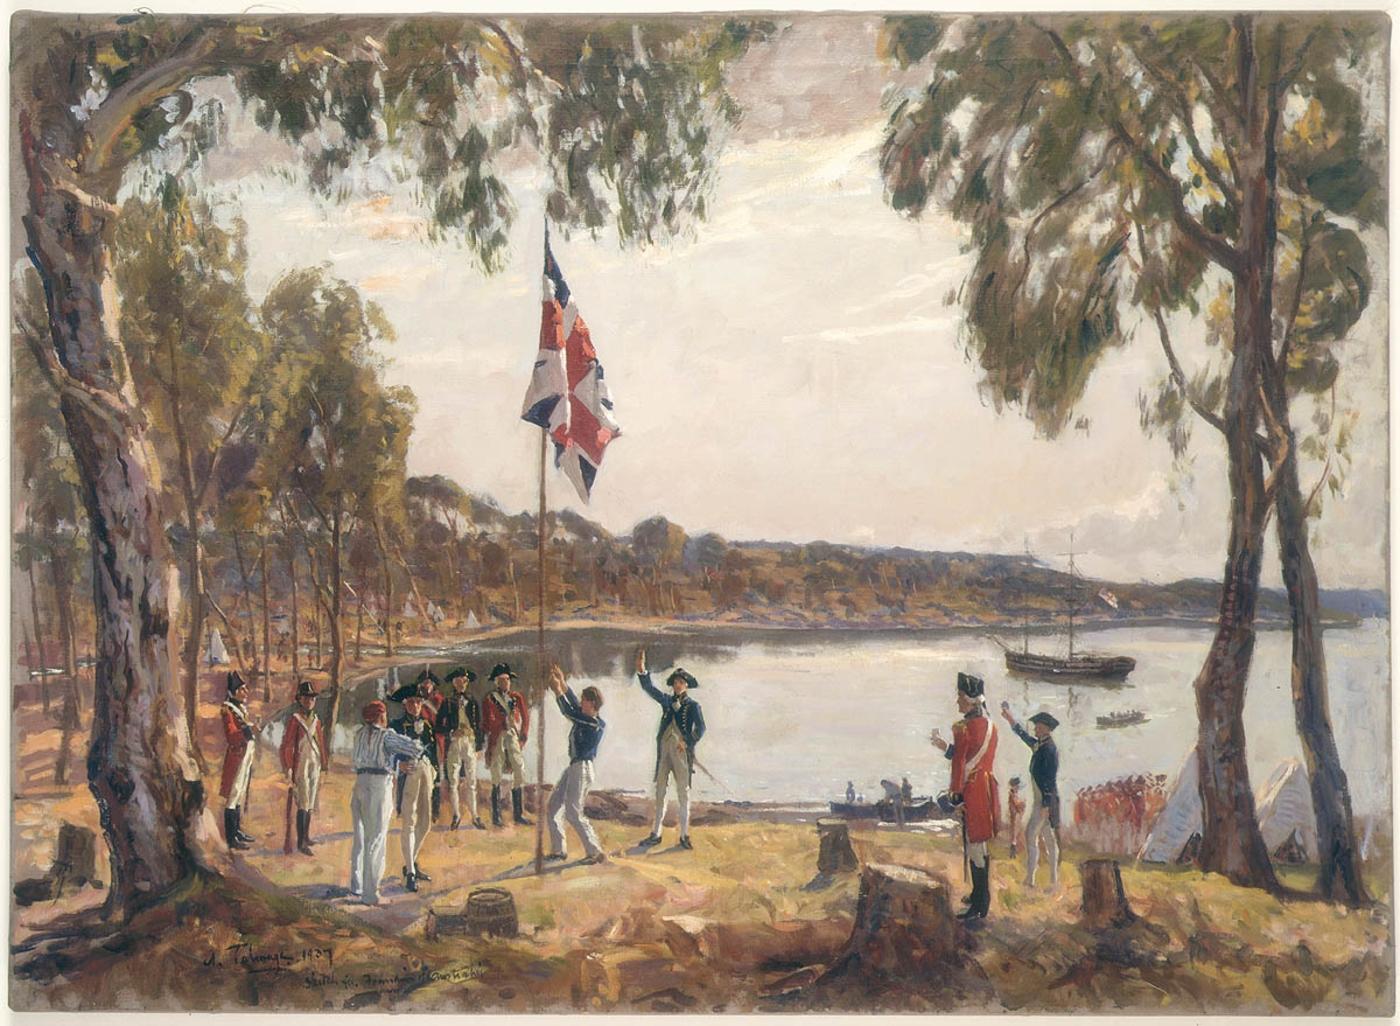 The Founding of Australia. By Capt. Arthur Phillip R.N. Sydney Cove, Jan. 26th 1788. Oil sketch by Algernon Talmage, 1937.